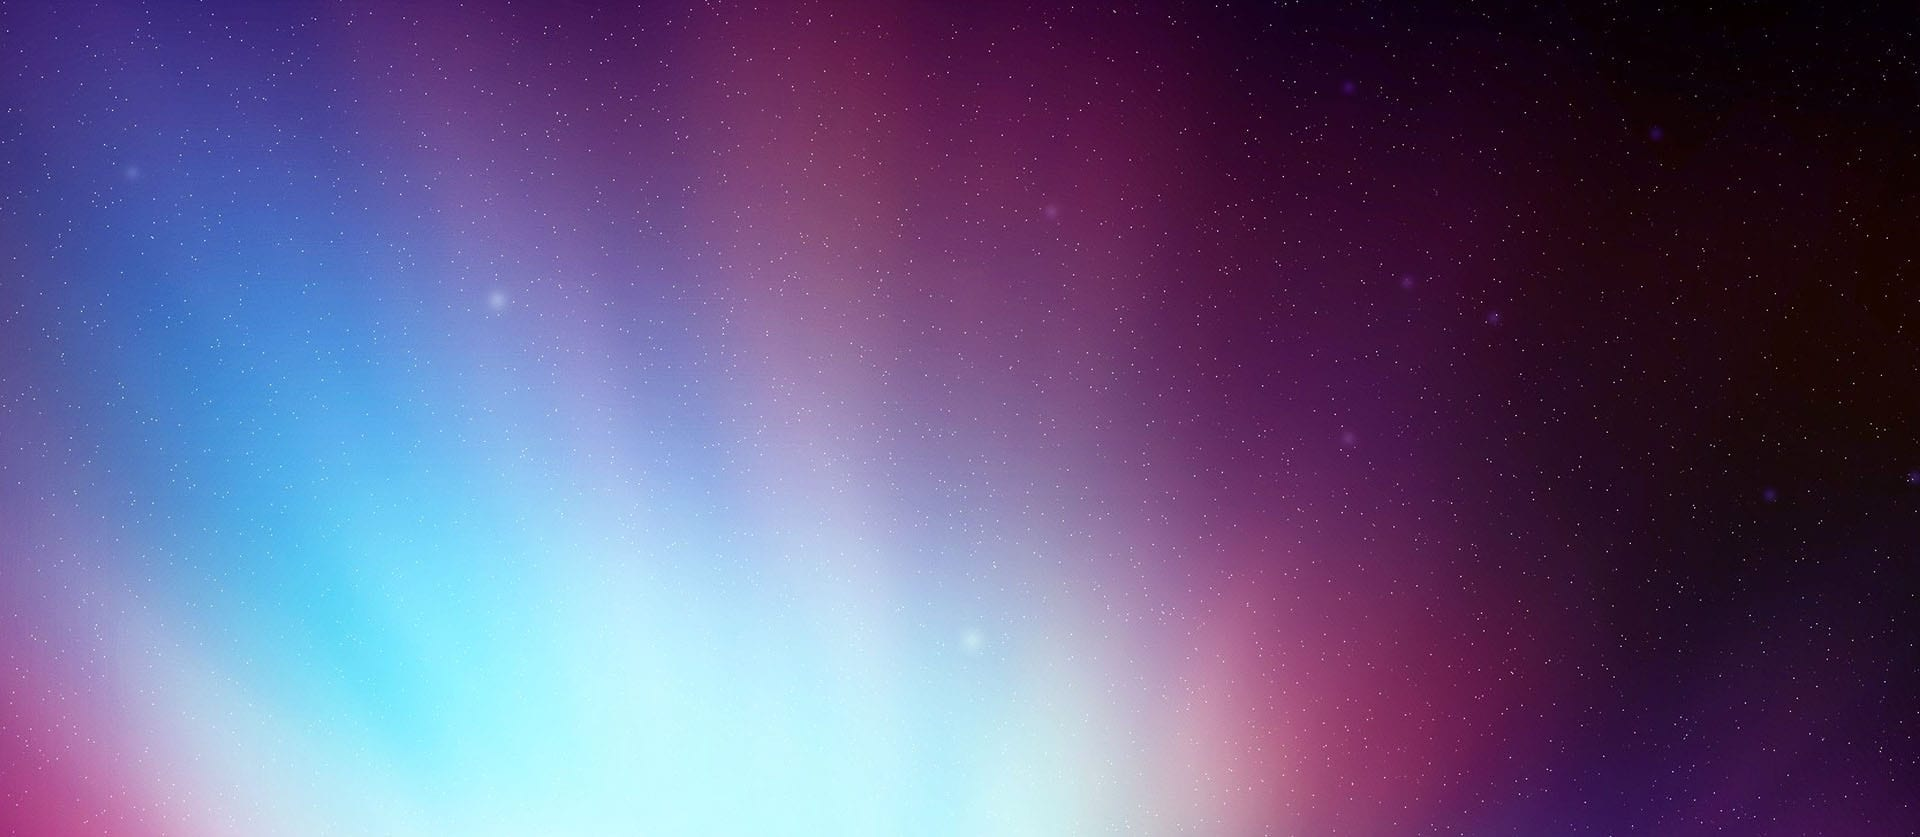 xrite-colour-profiling-background